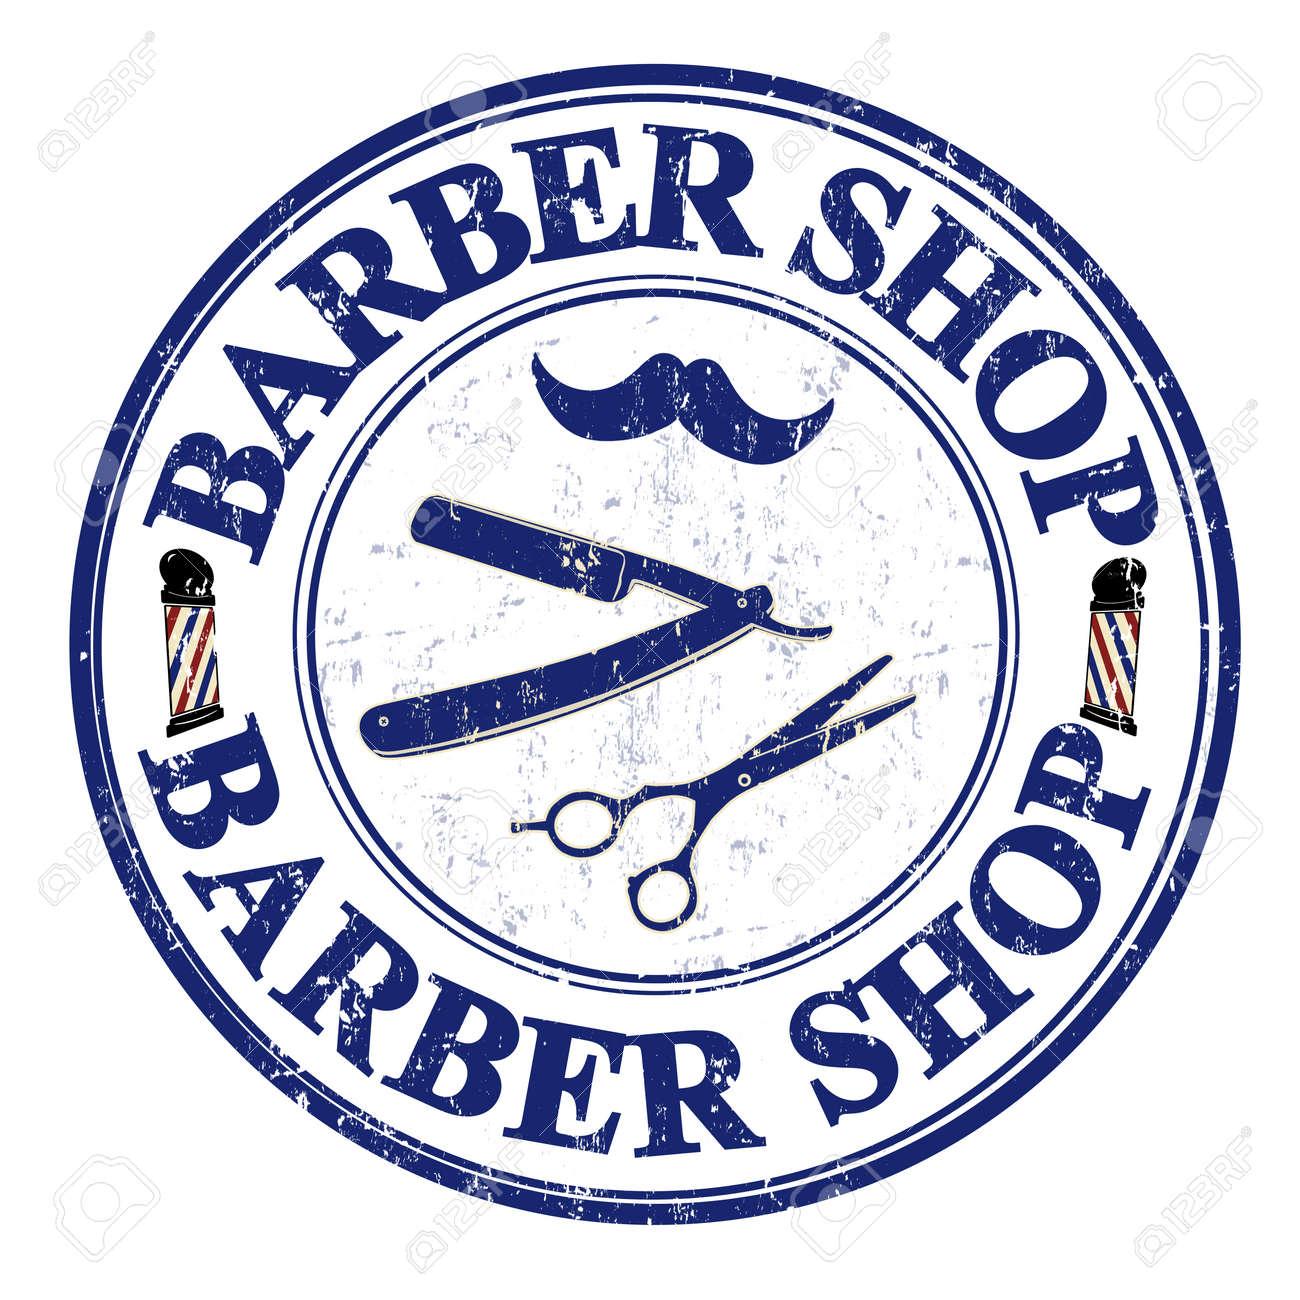 Barber shop grunge rubber stamp on white, vector illustration Stock Vector - 24533683